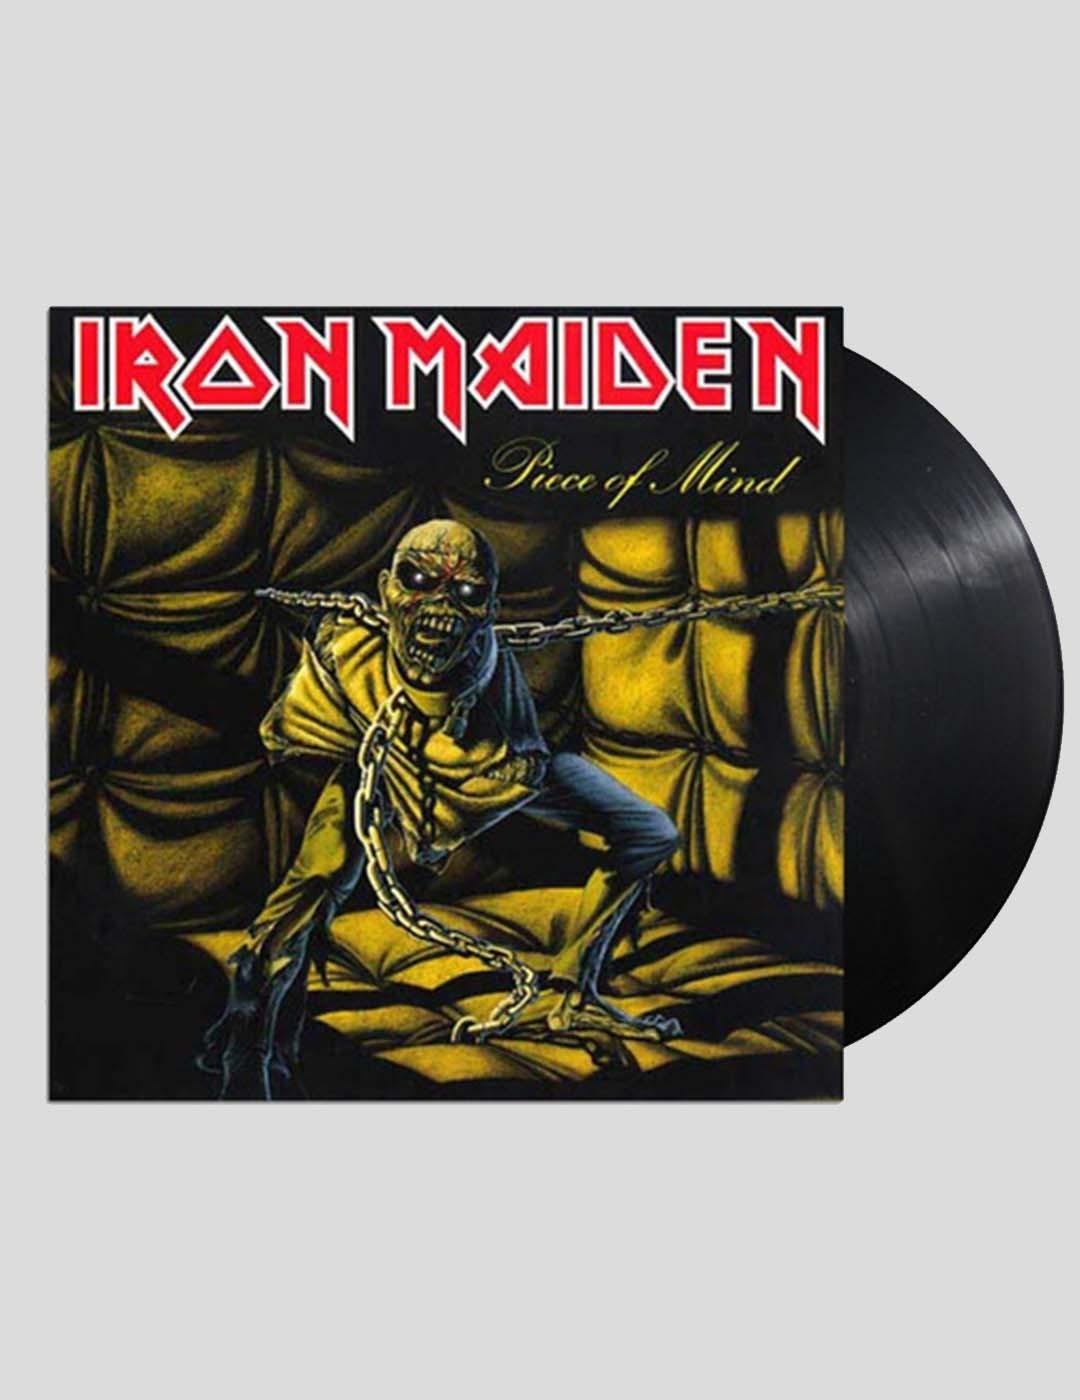 VINILO IRON MAIDEN - PIECE OF MIND LP VINYL